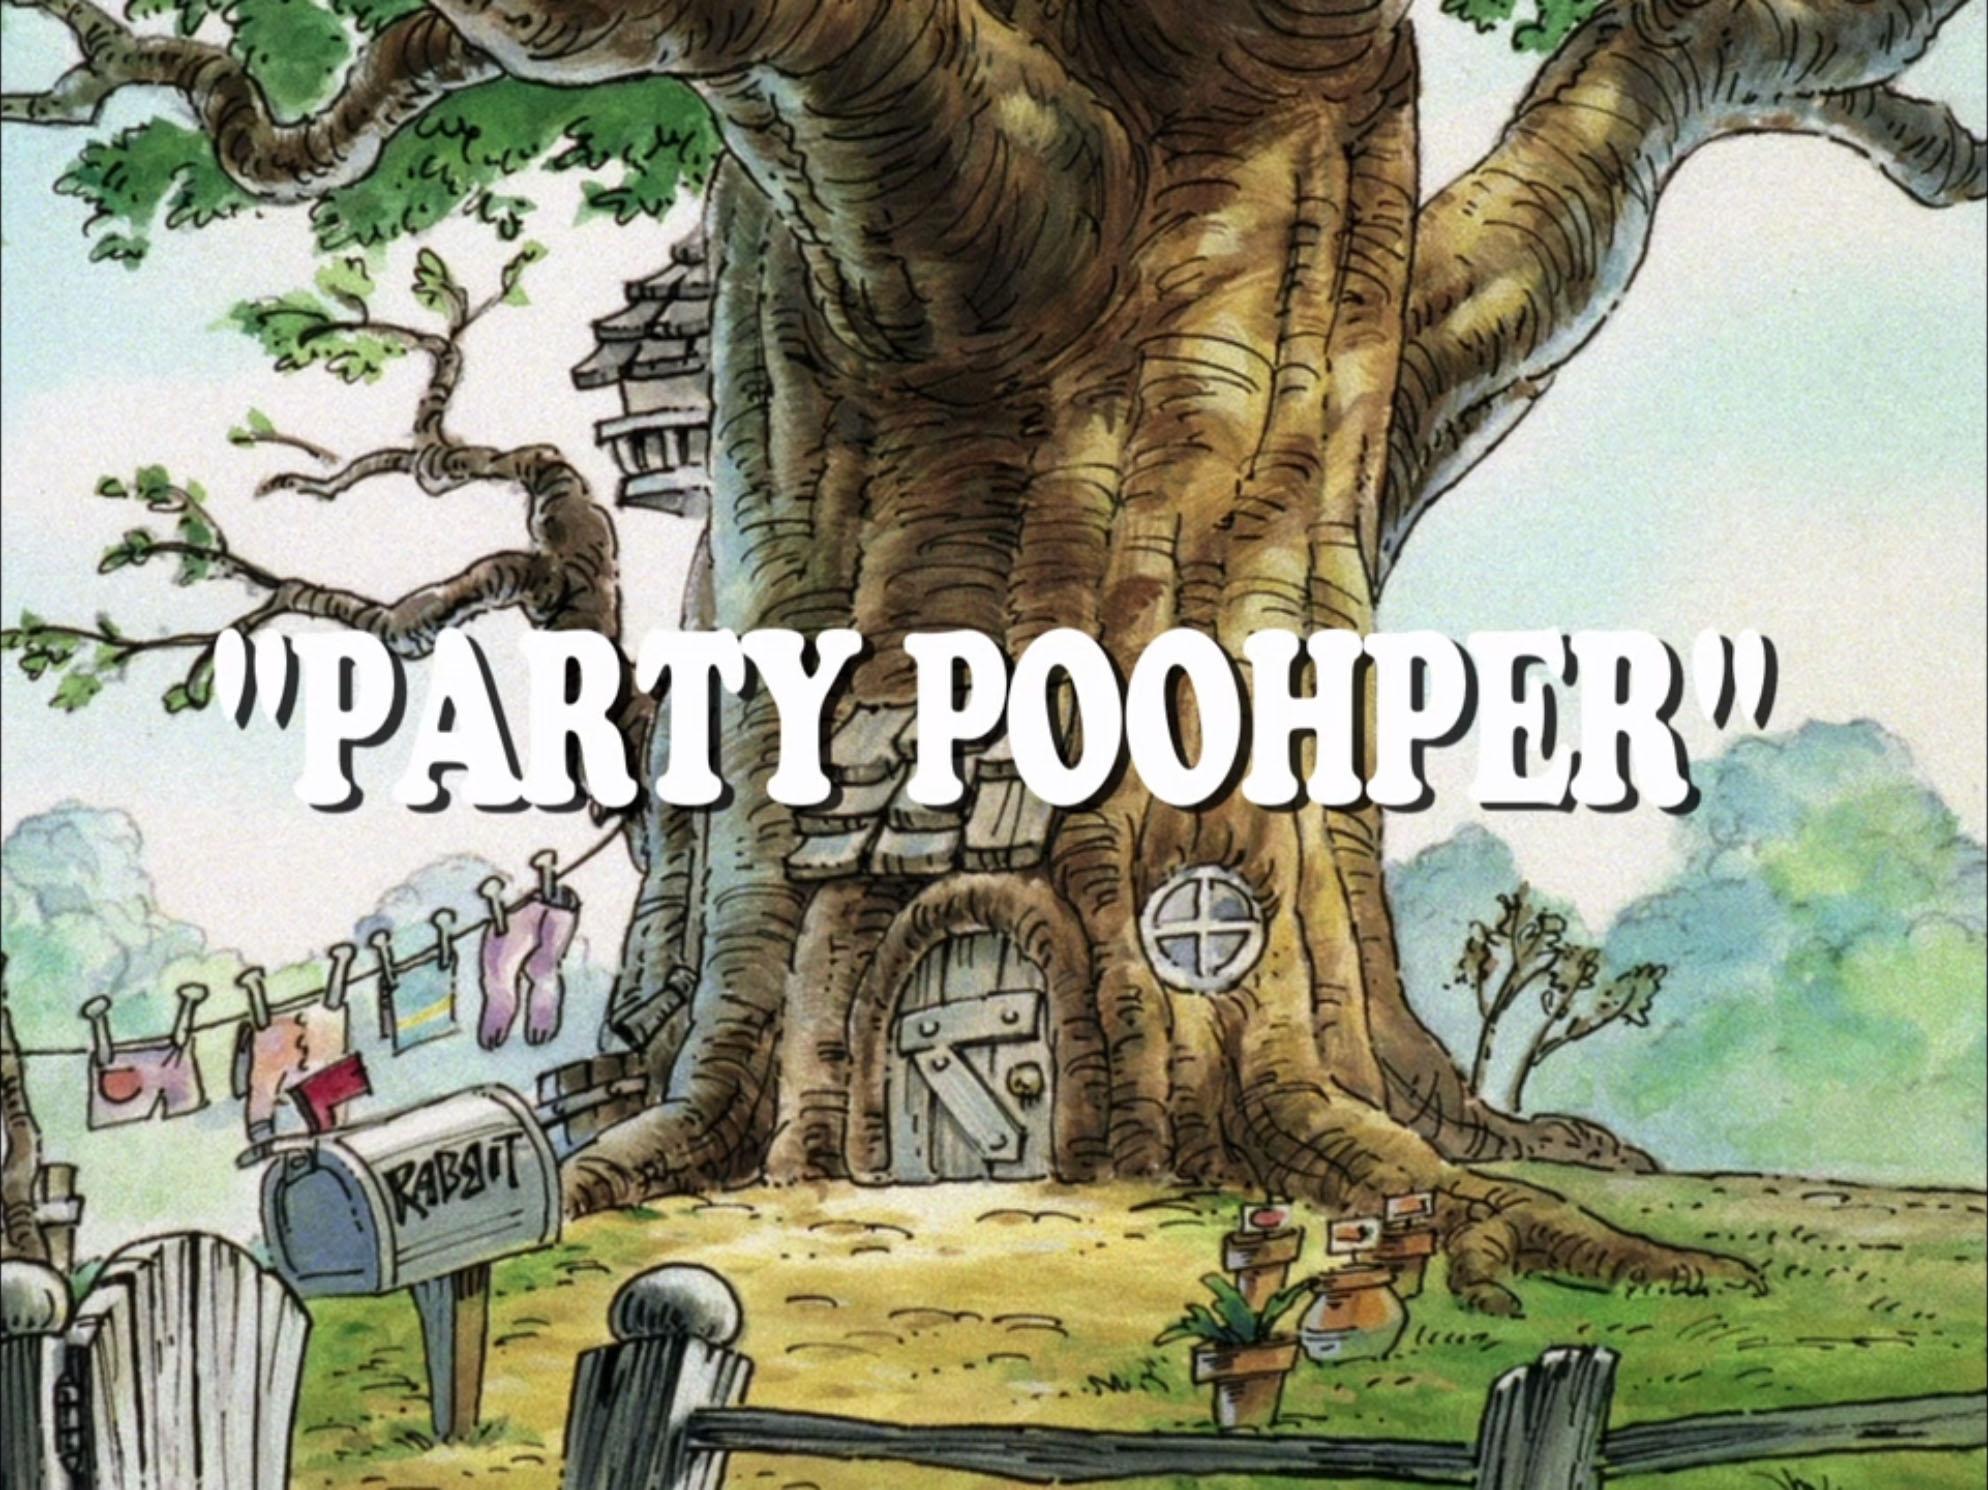 File:Party Poohper.jpg